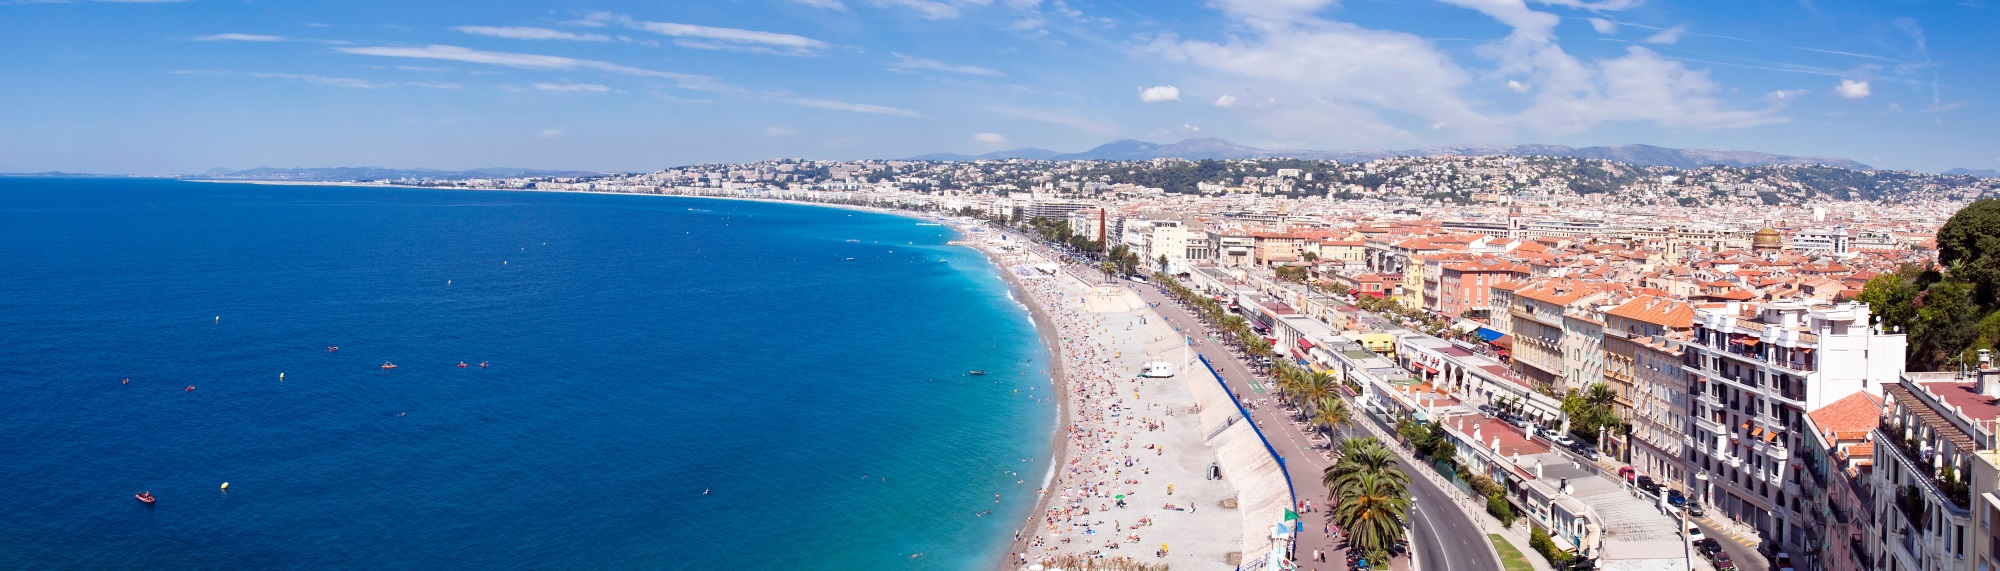 Nizza Stadtteile Panorama